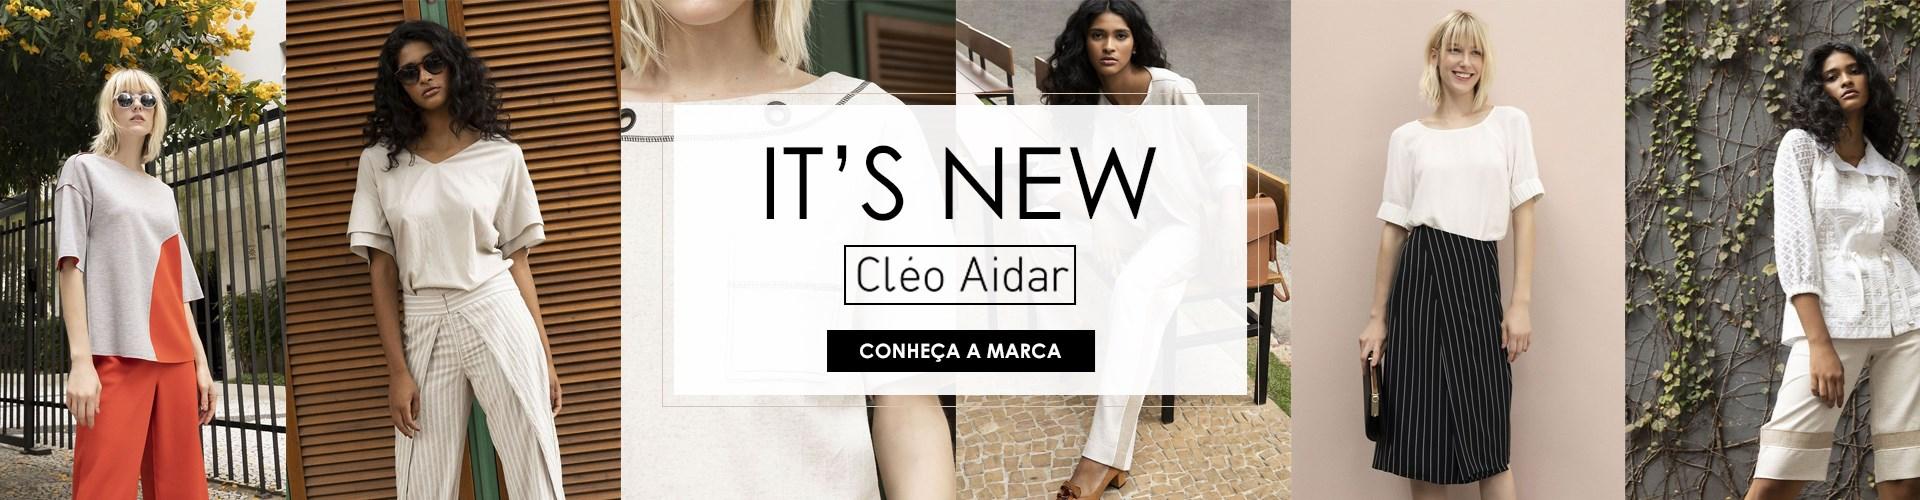 Cleo-Aidar